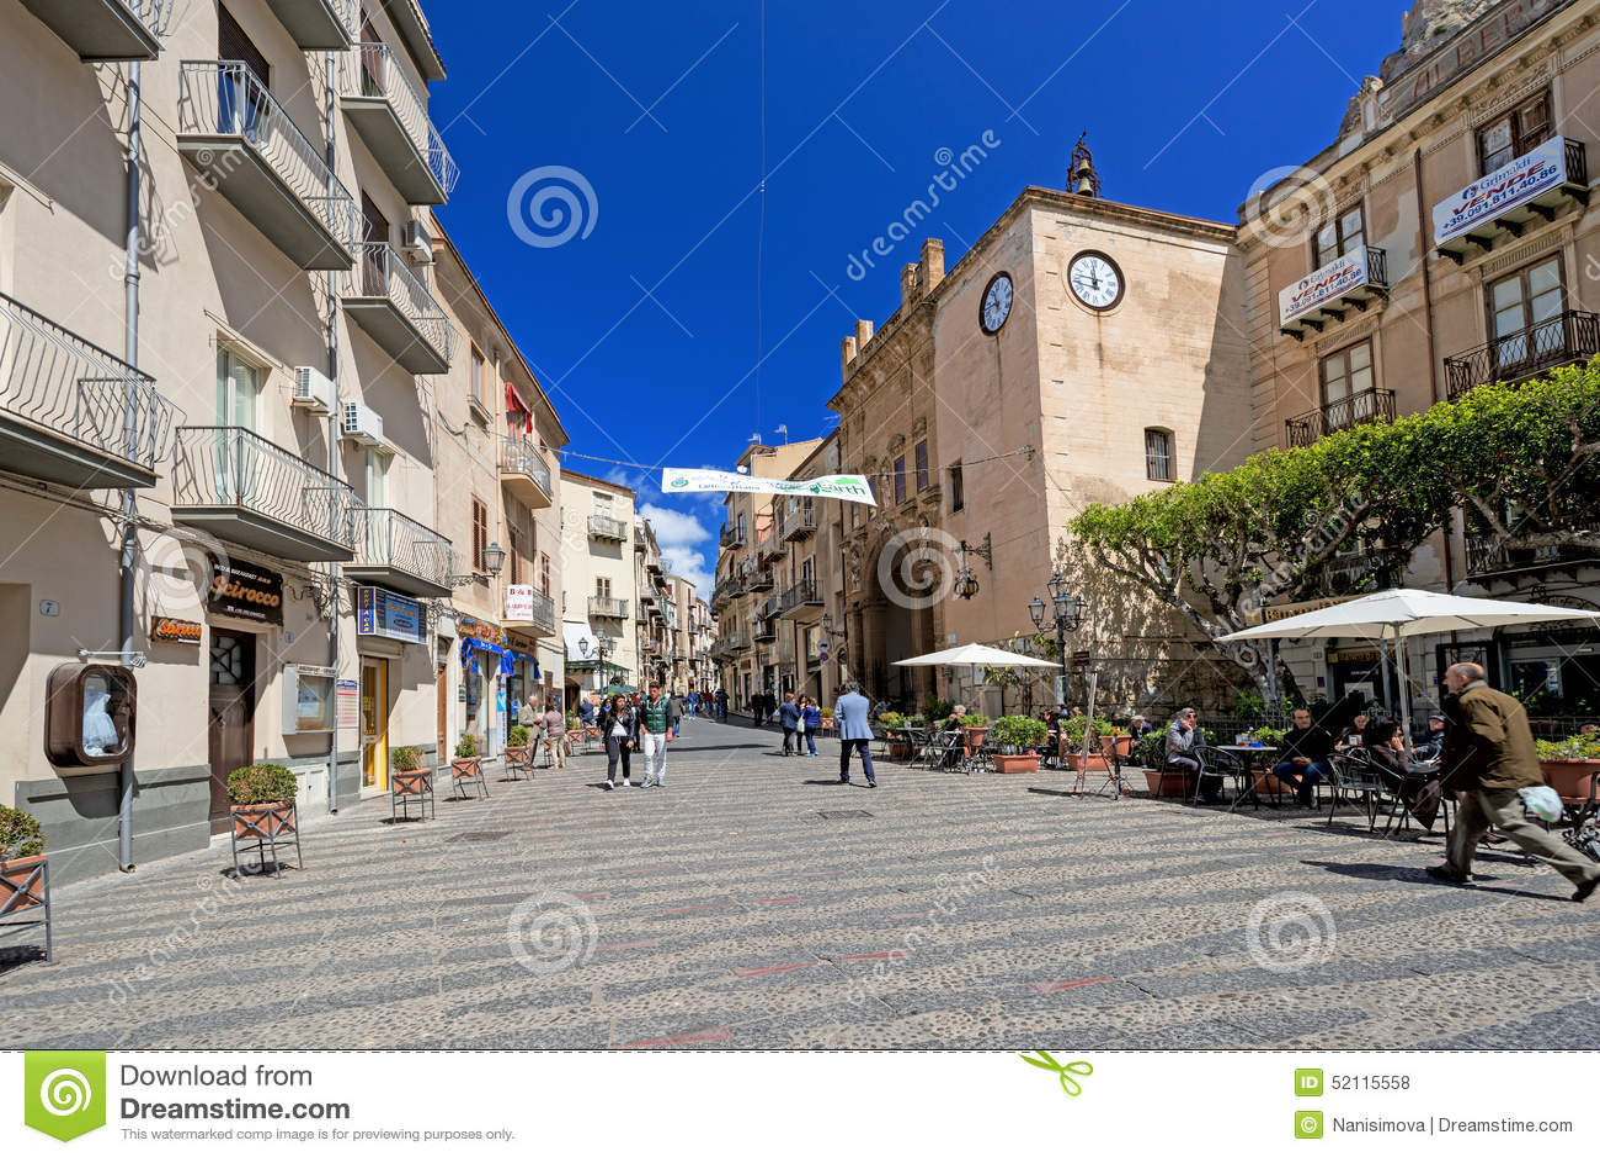 Catania Street